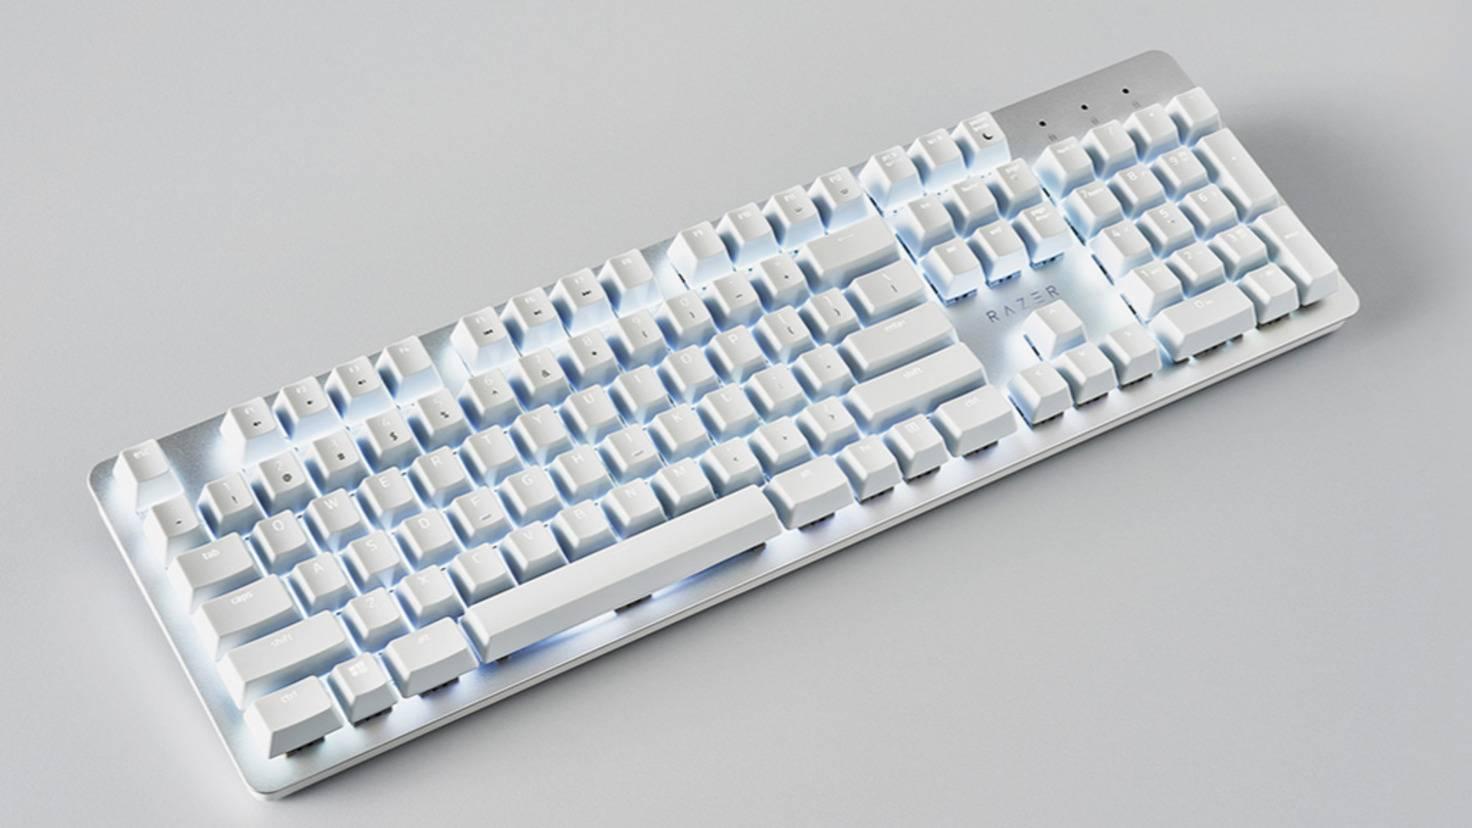 razer-pro-type-clavier-bureau-2